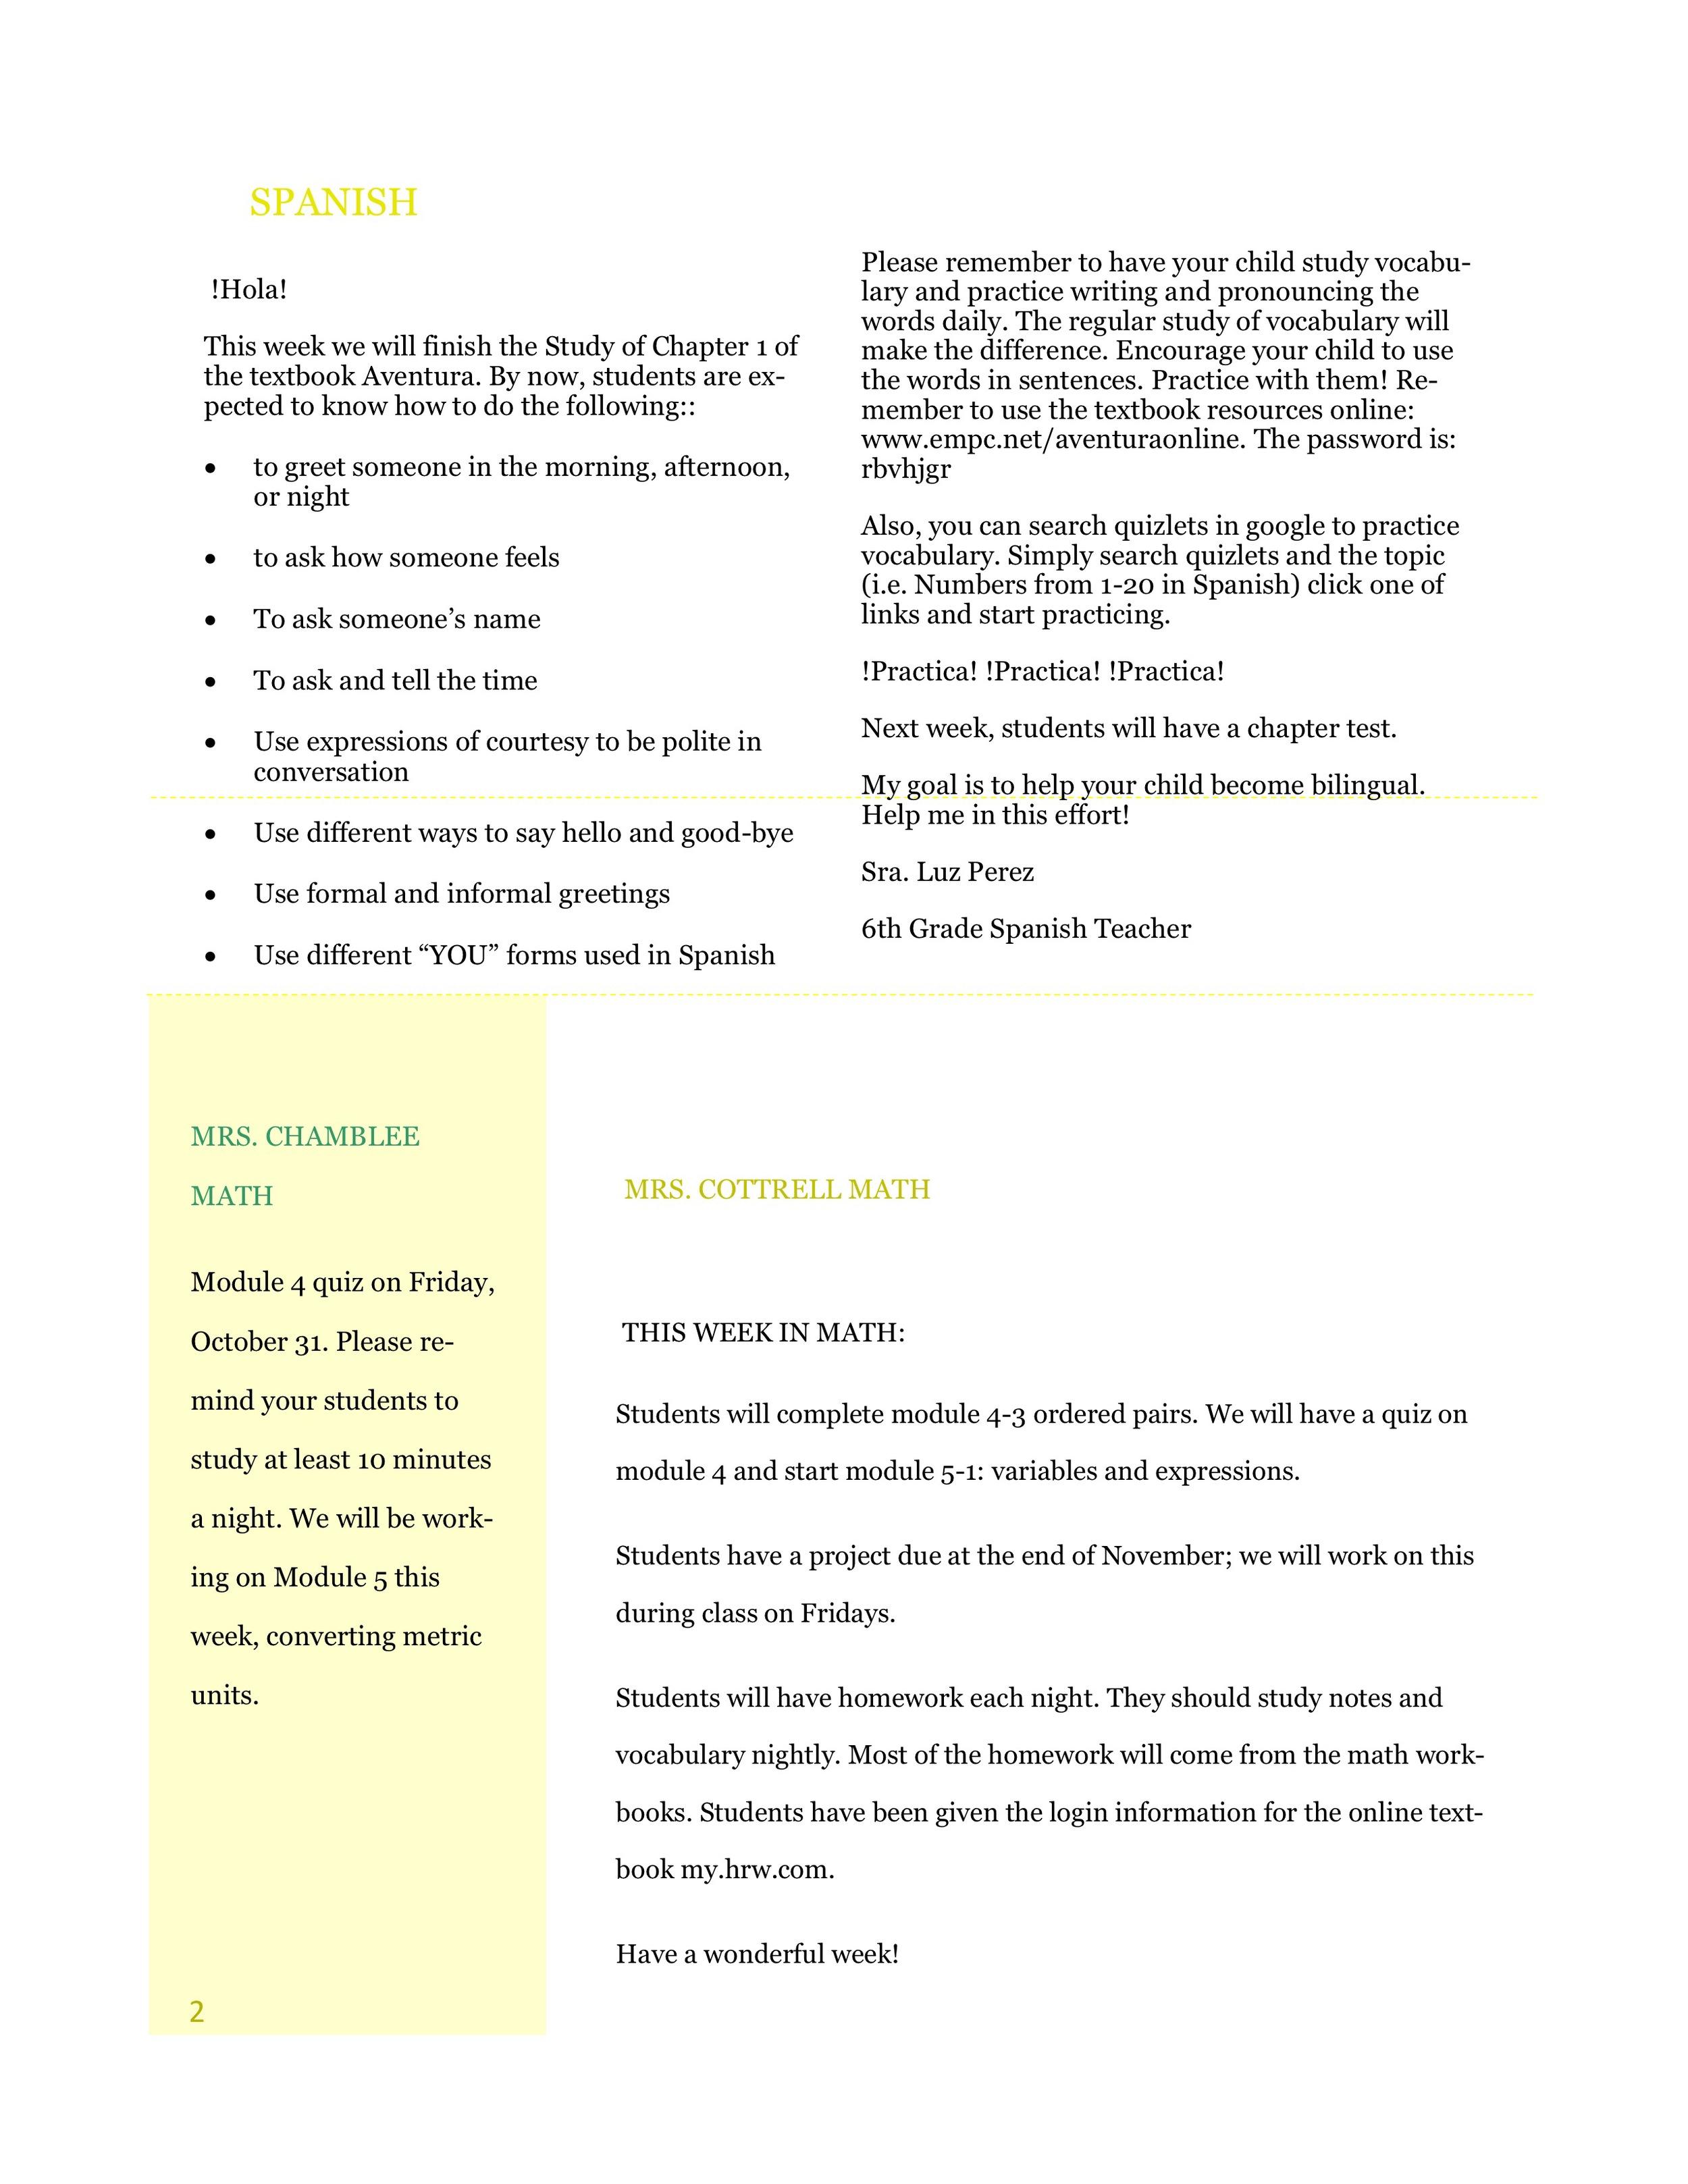 Newsletter Image6th grade October 27-31 2.jpeg